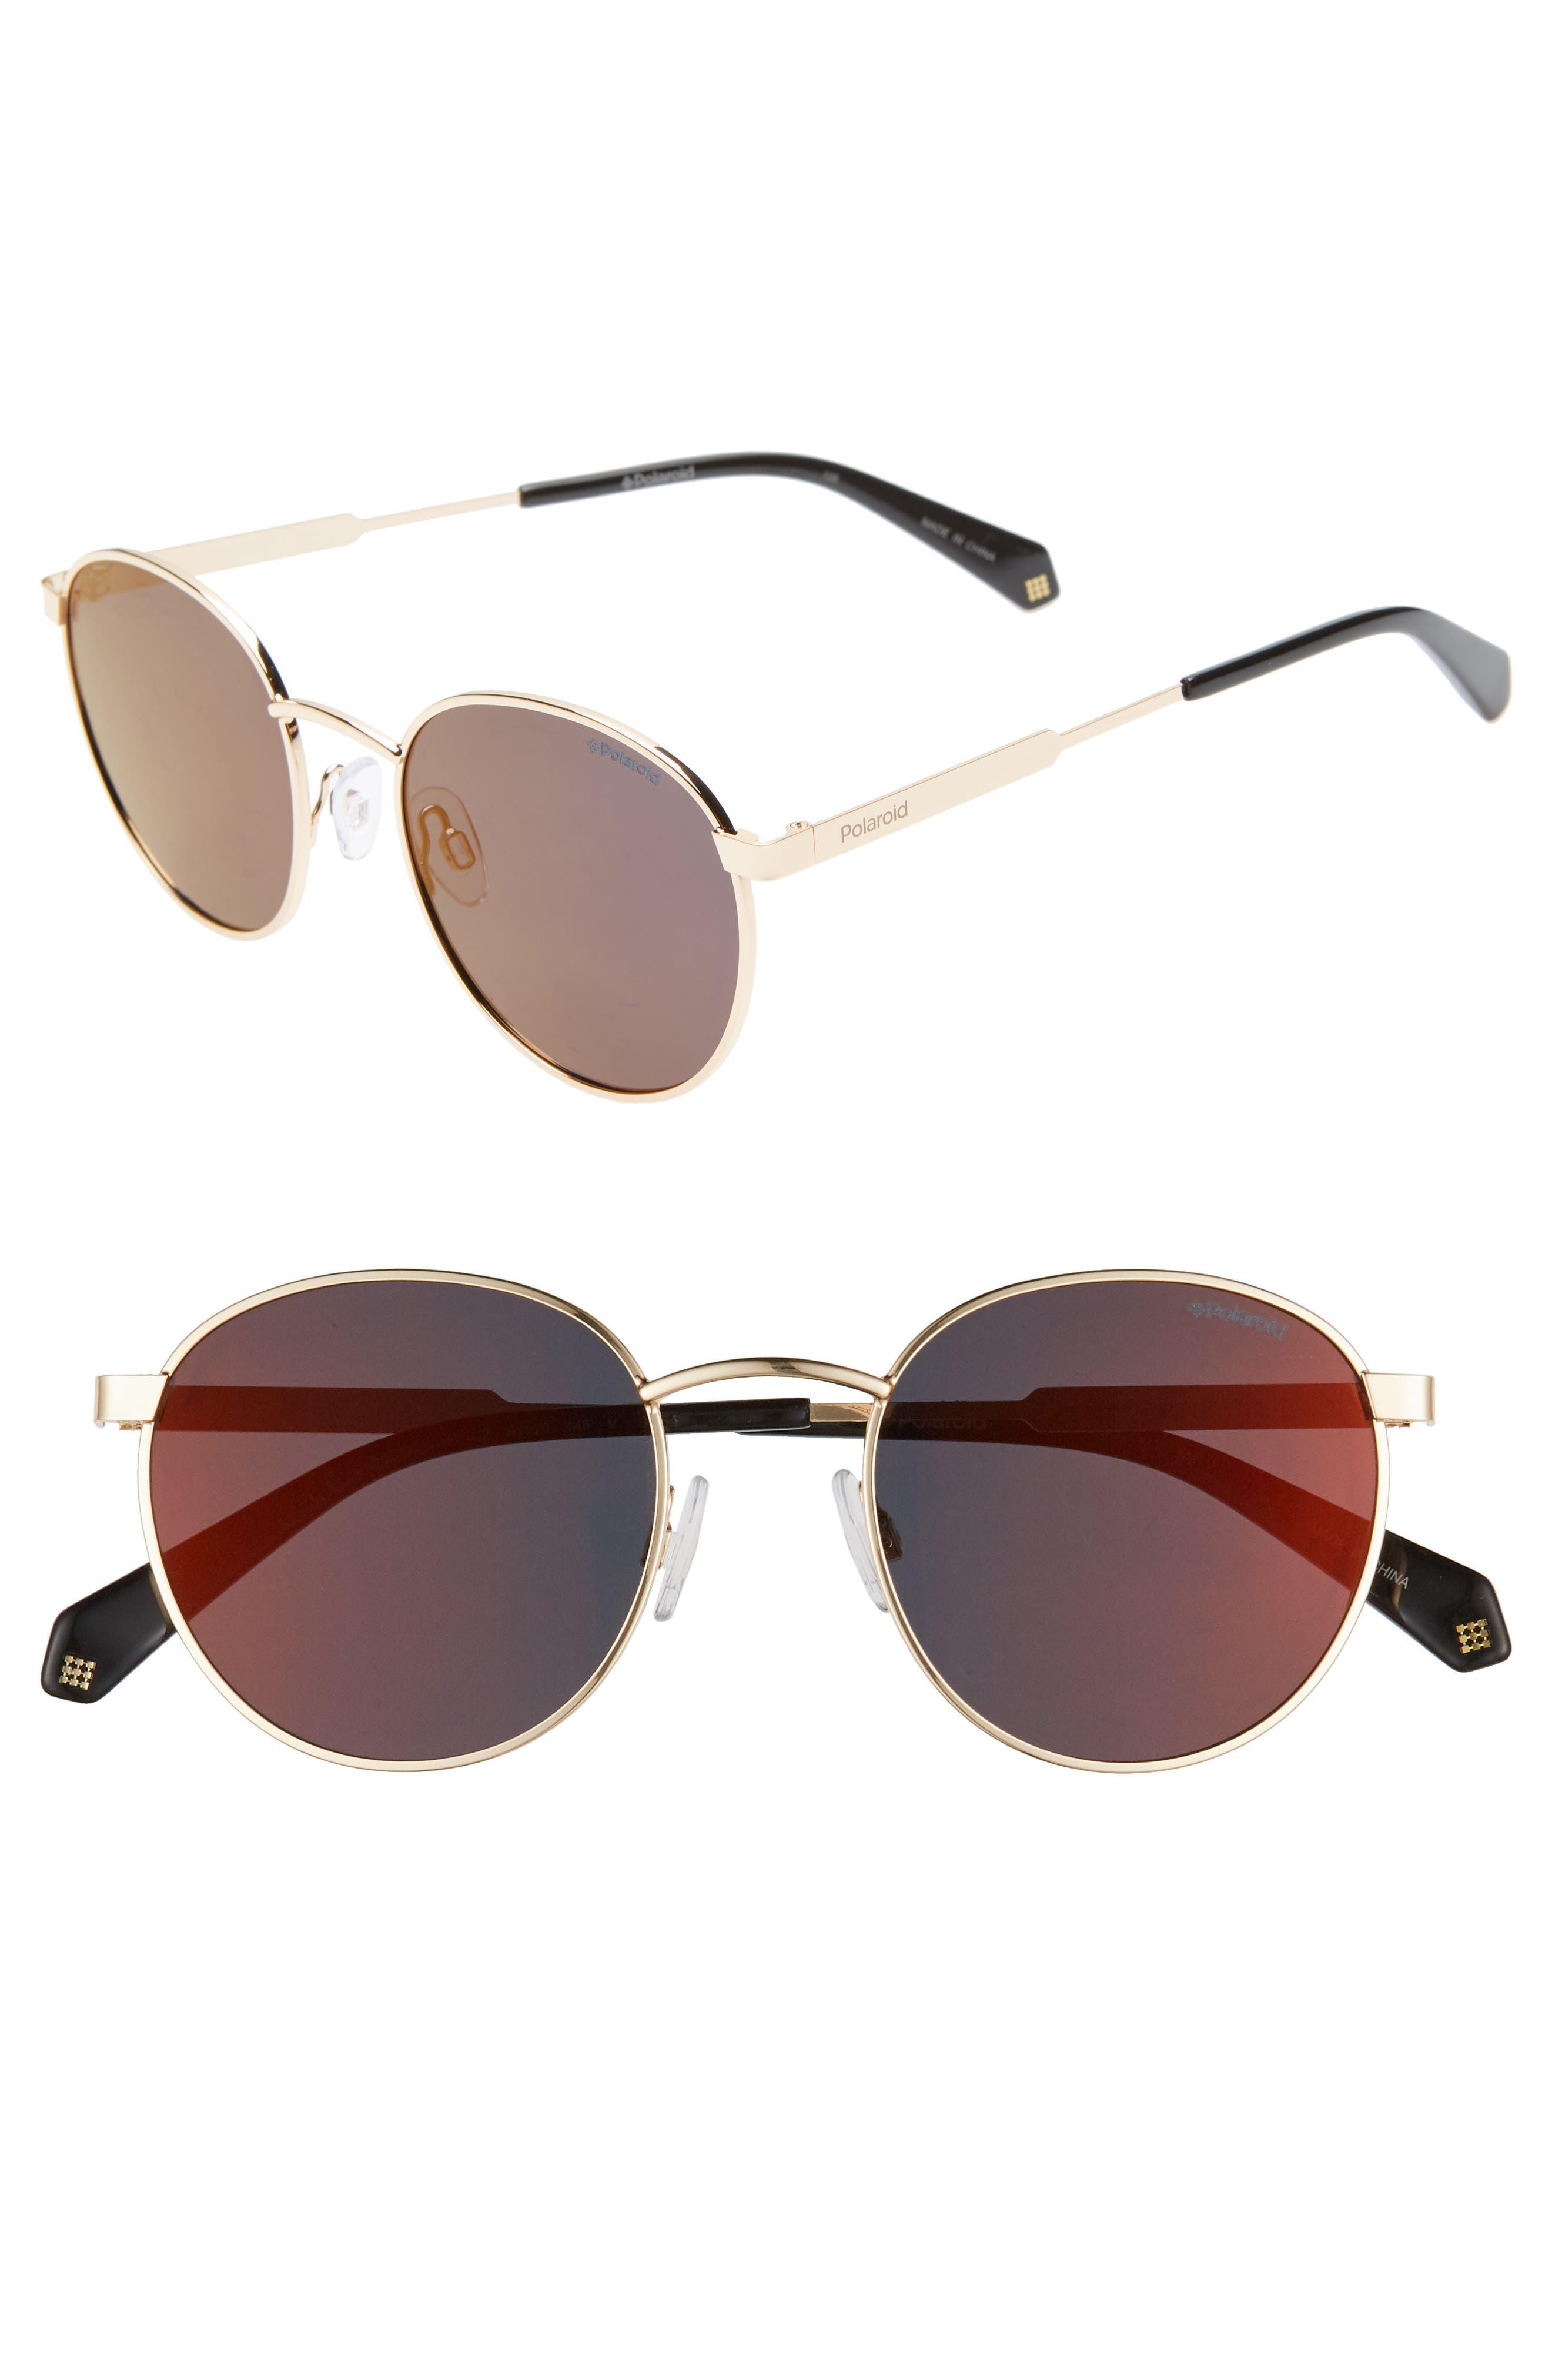 Polaroid 51Mm Polarized Round Sunglasses - Gold/ Burgundy